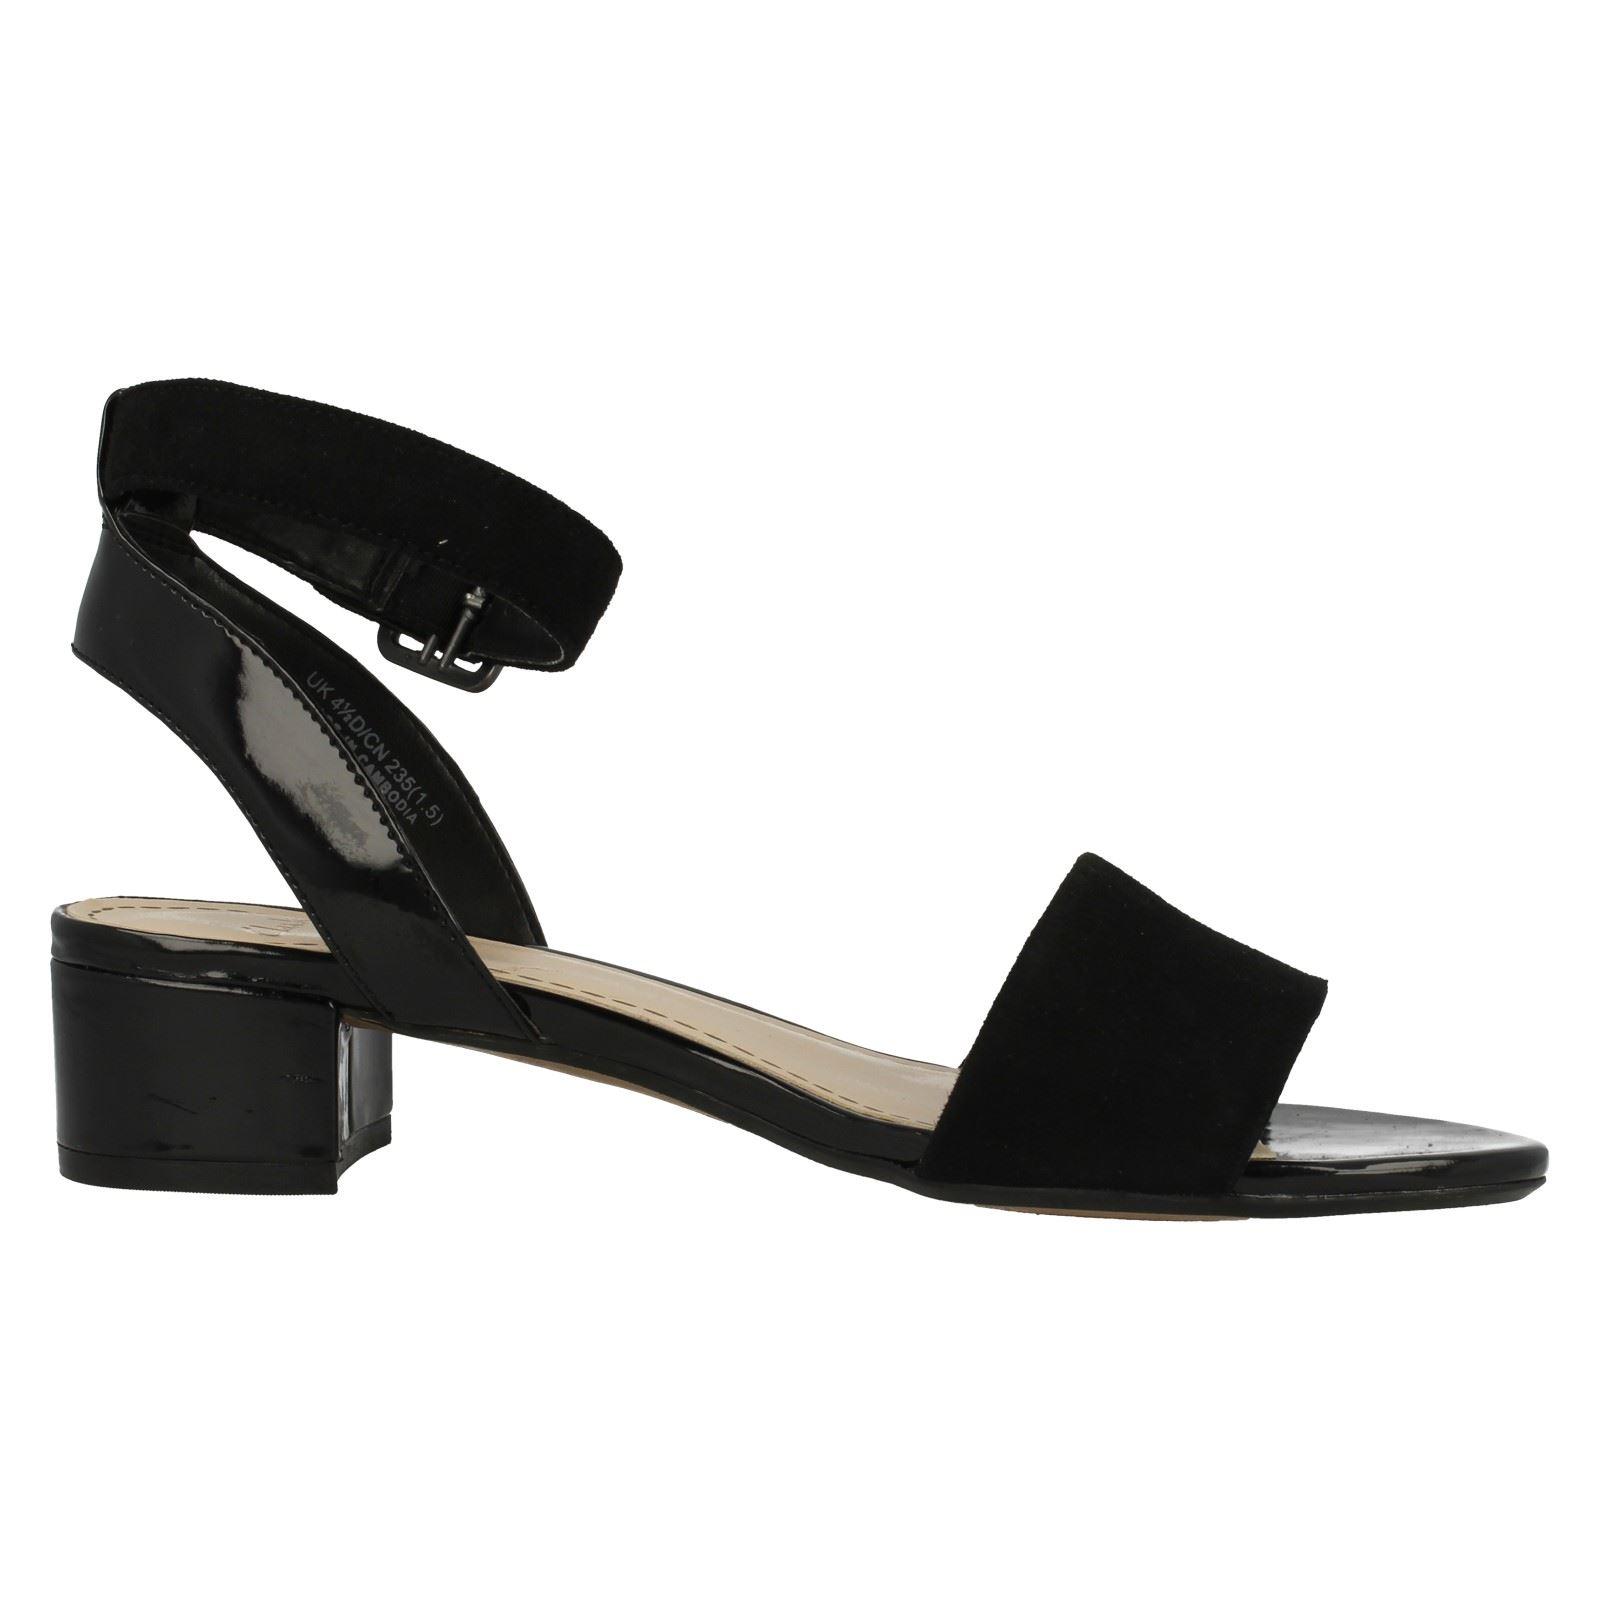 0e6d63b44d75e Ladies-Clarks-Sandals-Sharna-Balcony thumbnail 8